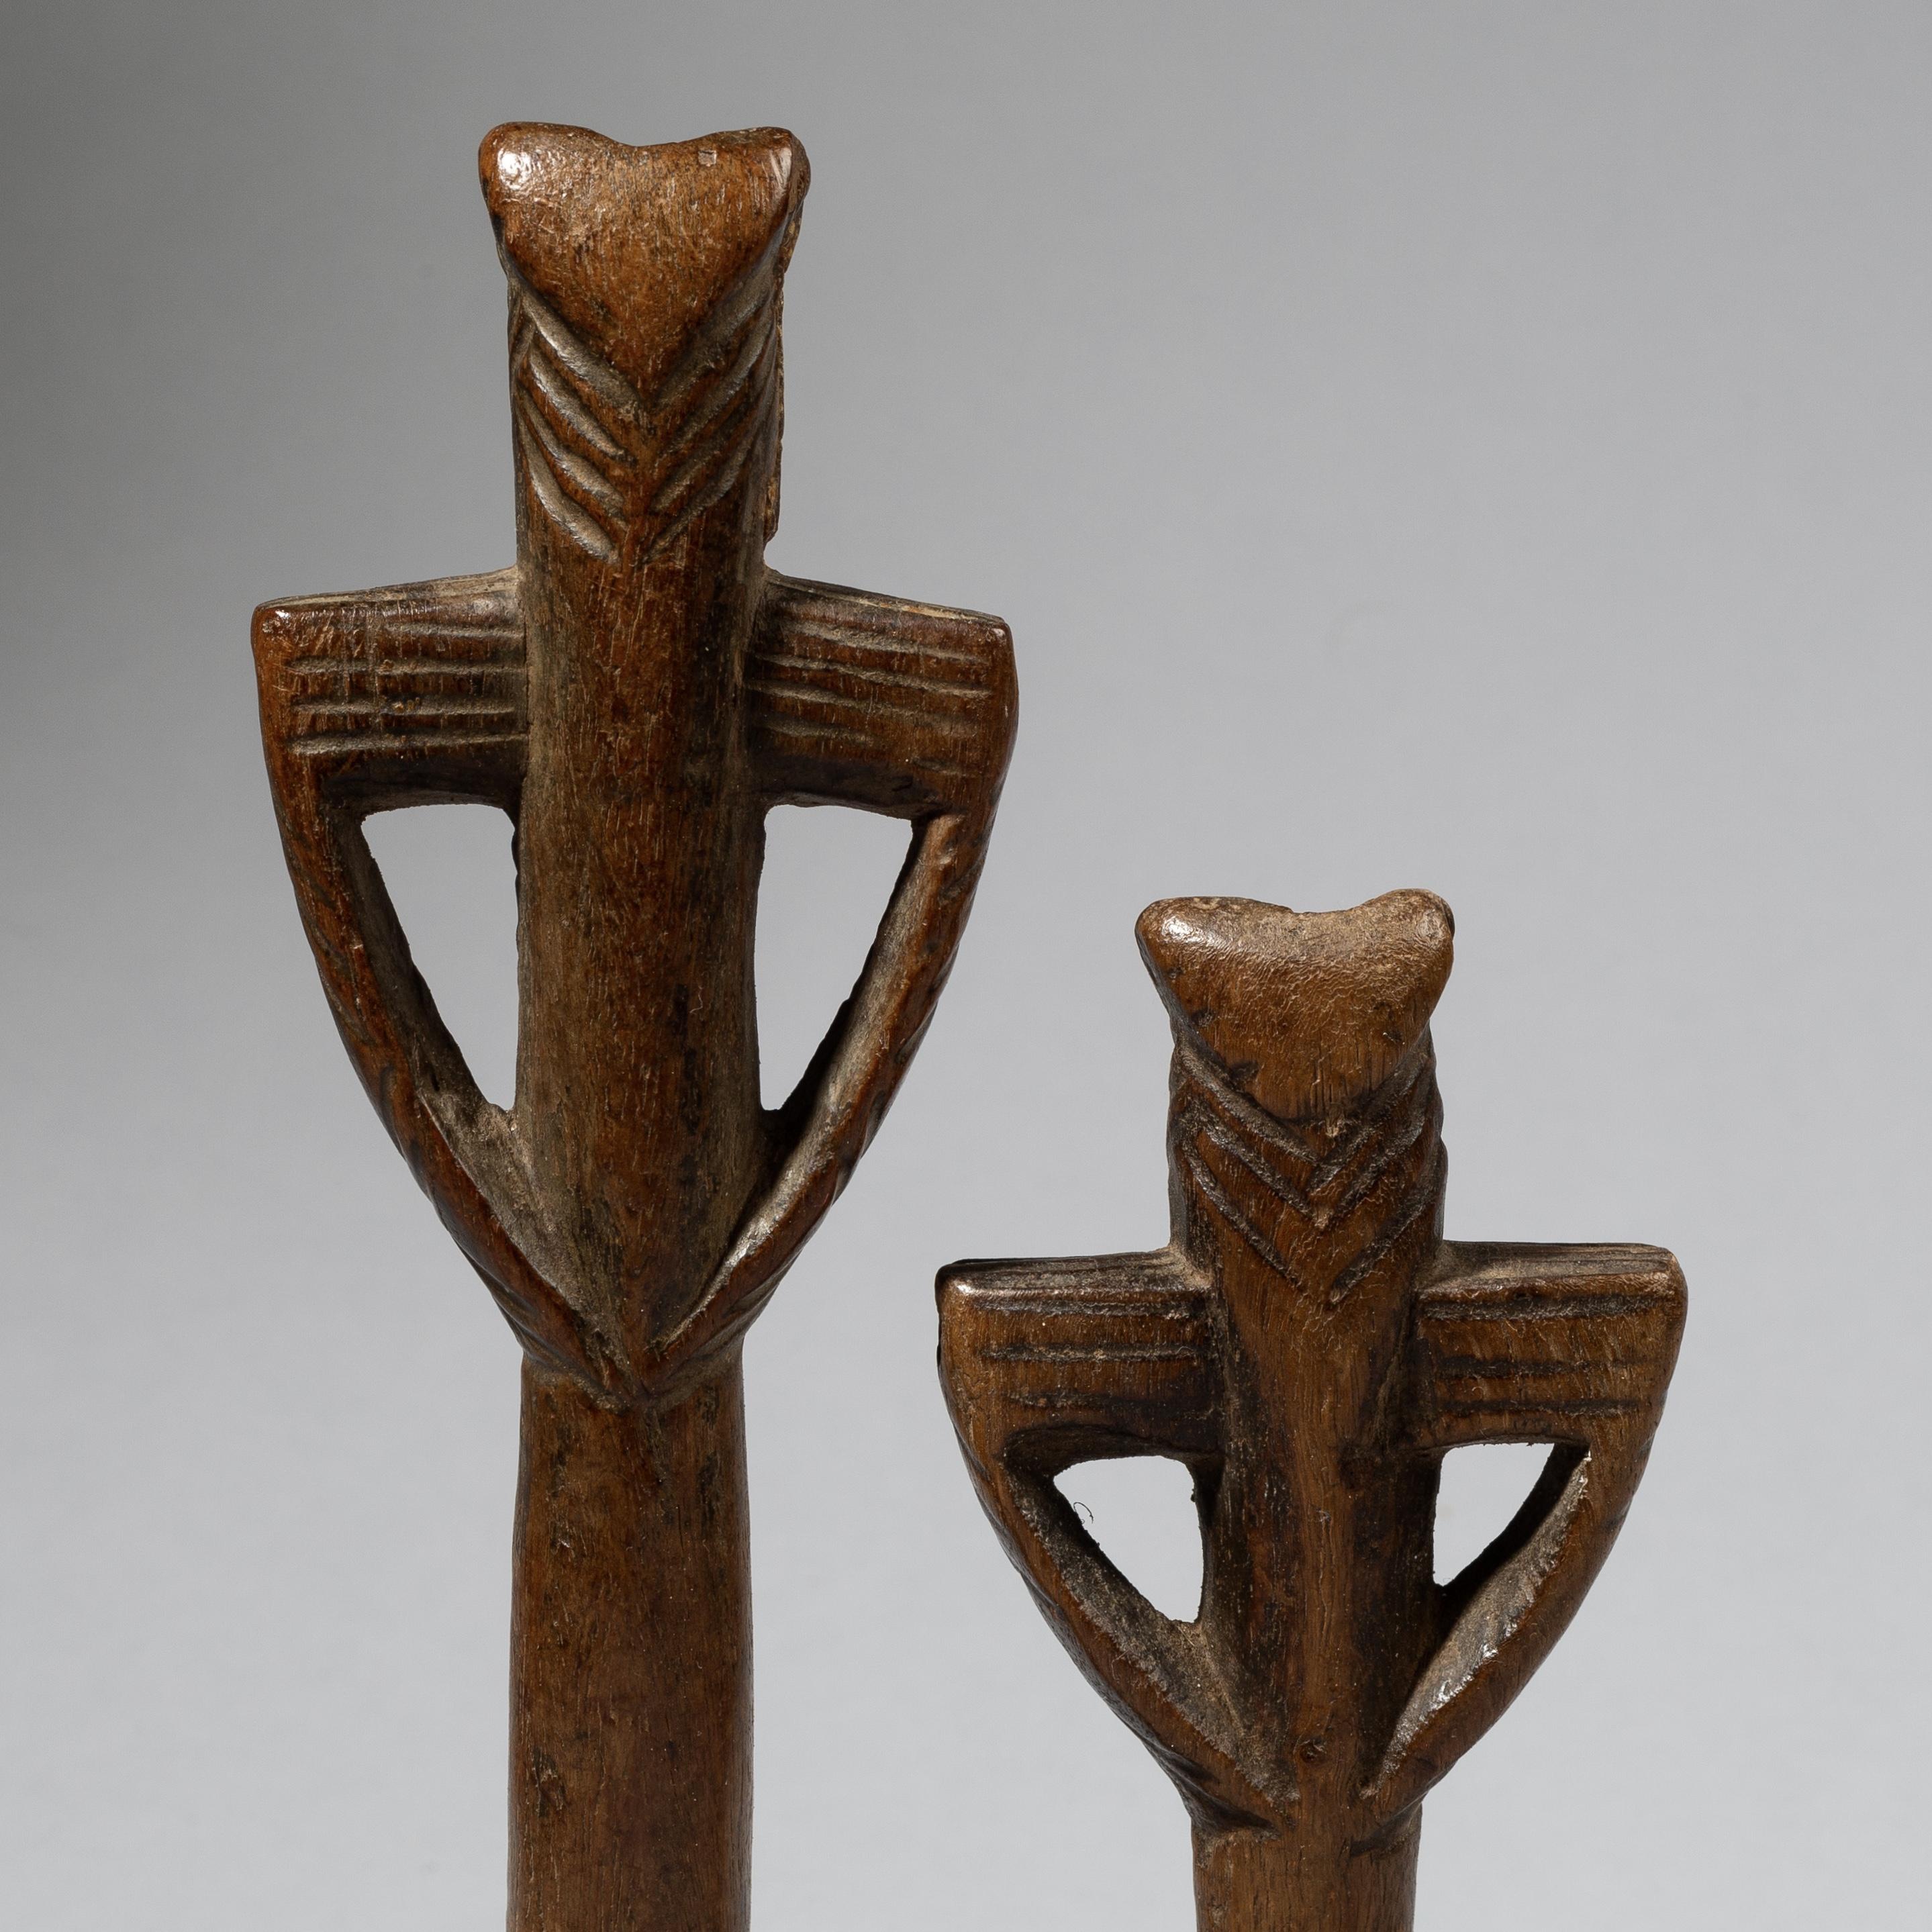 2 ANTHROPOMORPHIC WHISTLES, LOBI TRIBE OF BURKINA FASO, W. AFRICA ( No 4409)